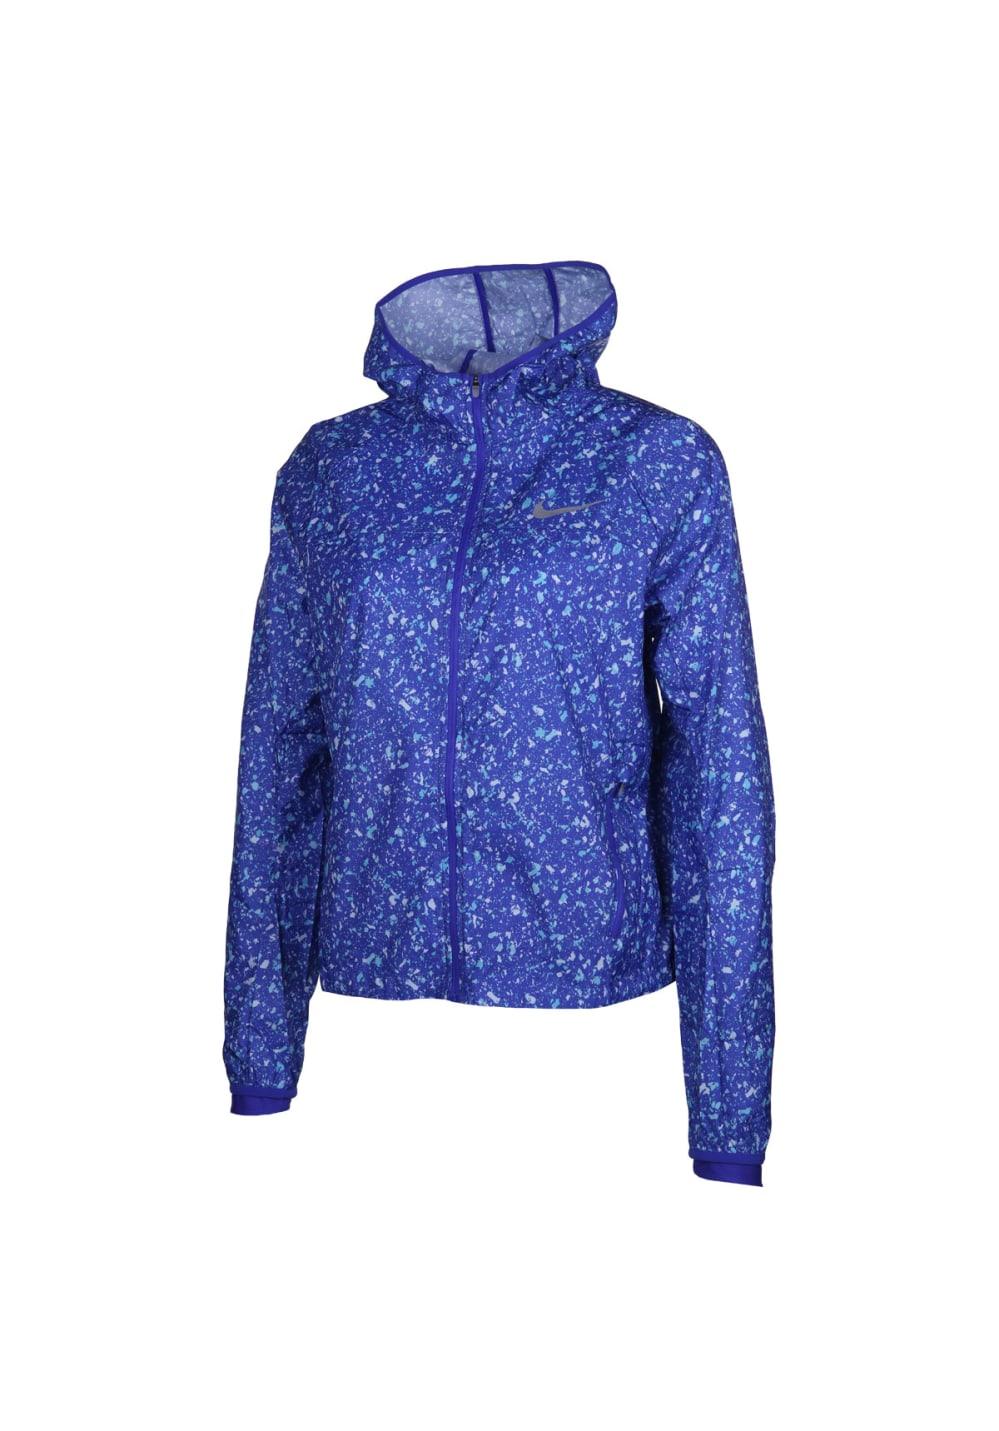 Nike Shield Running Jacket - Laufjacken für Damen - Lila